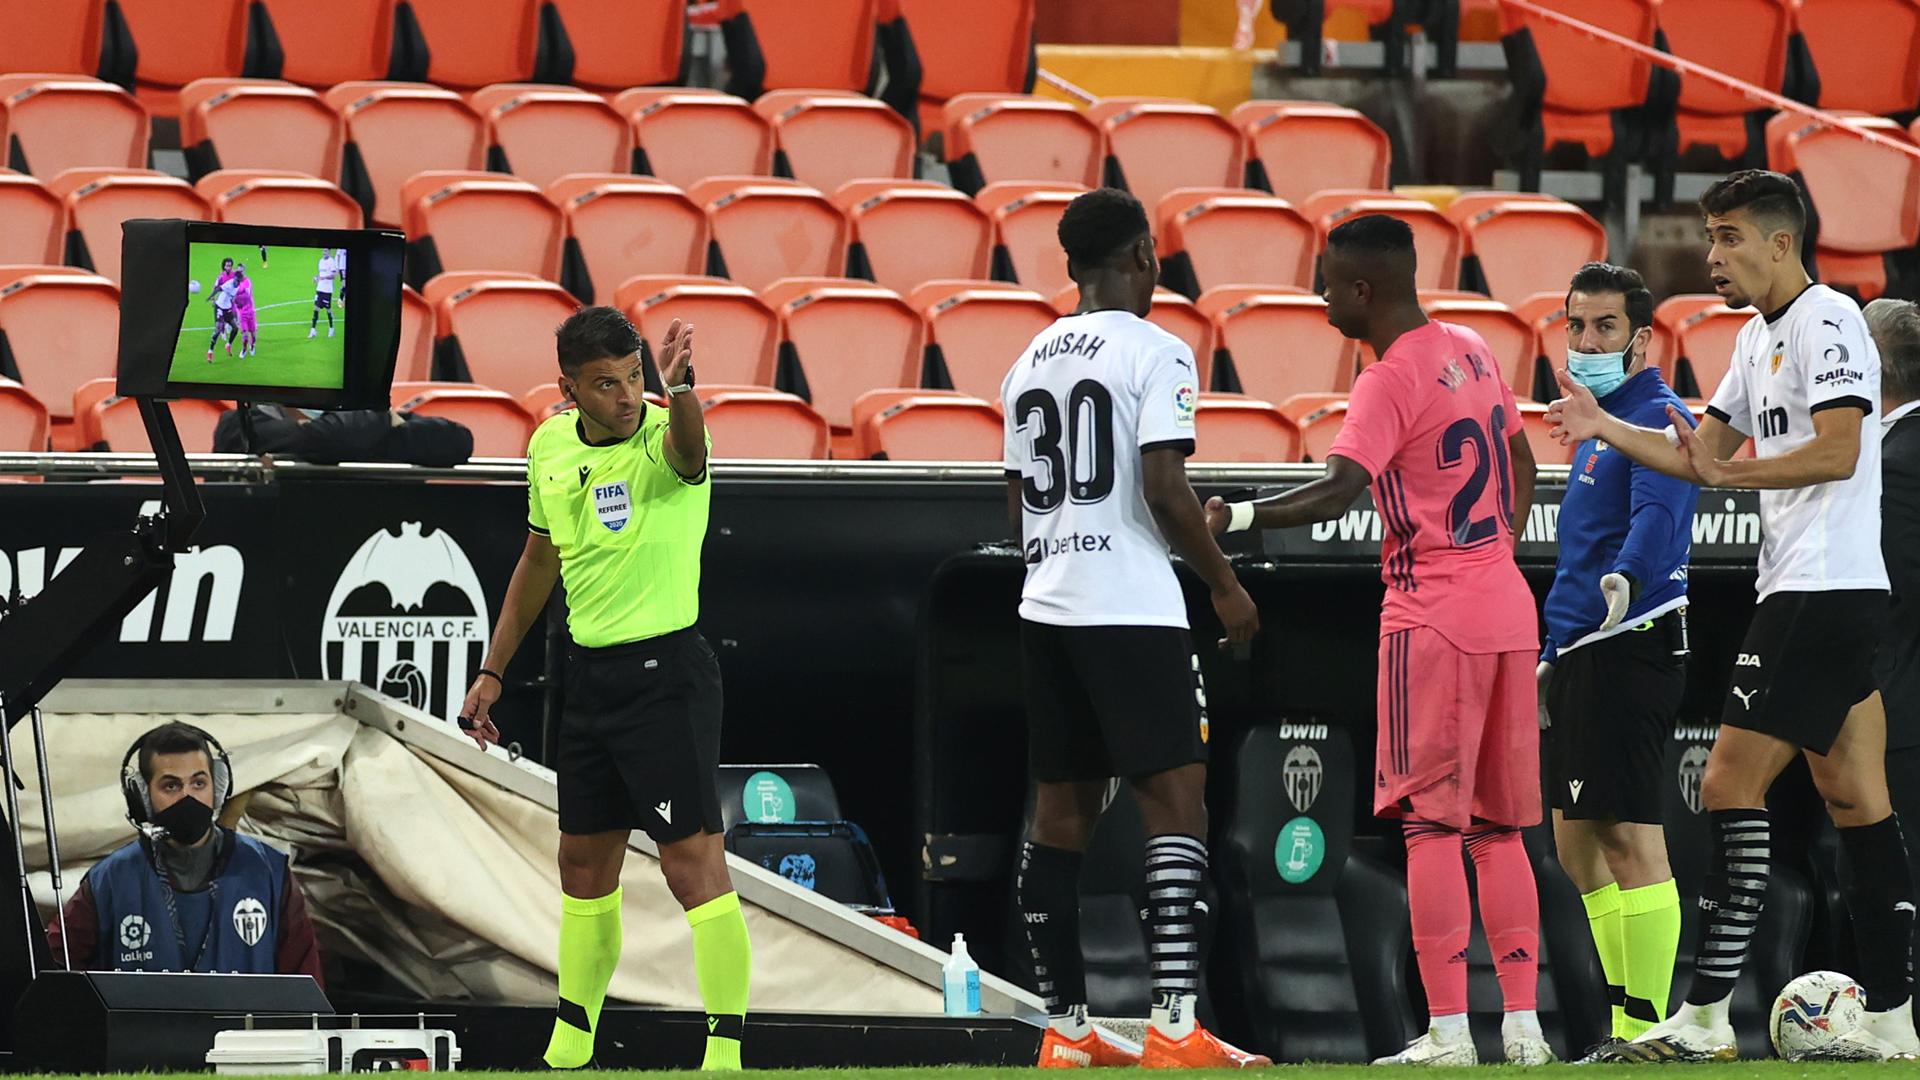 A qué equipos le pitaron tres o más penaltis en contra en un mismo partido  de LaLiga? | Goal.com